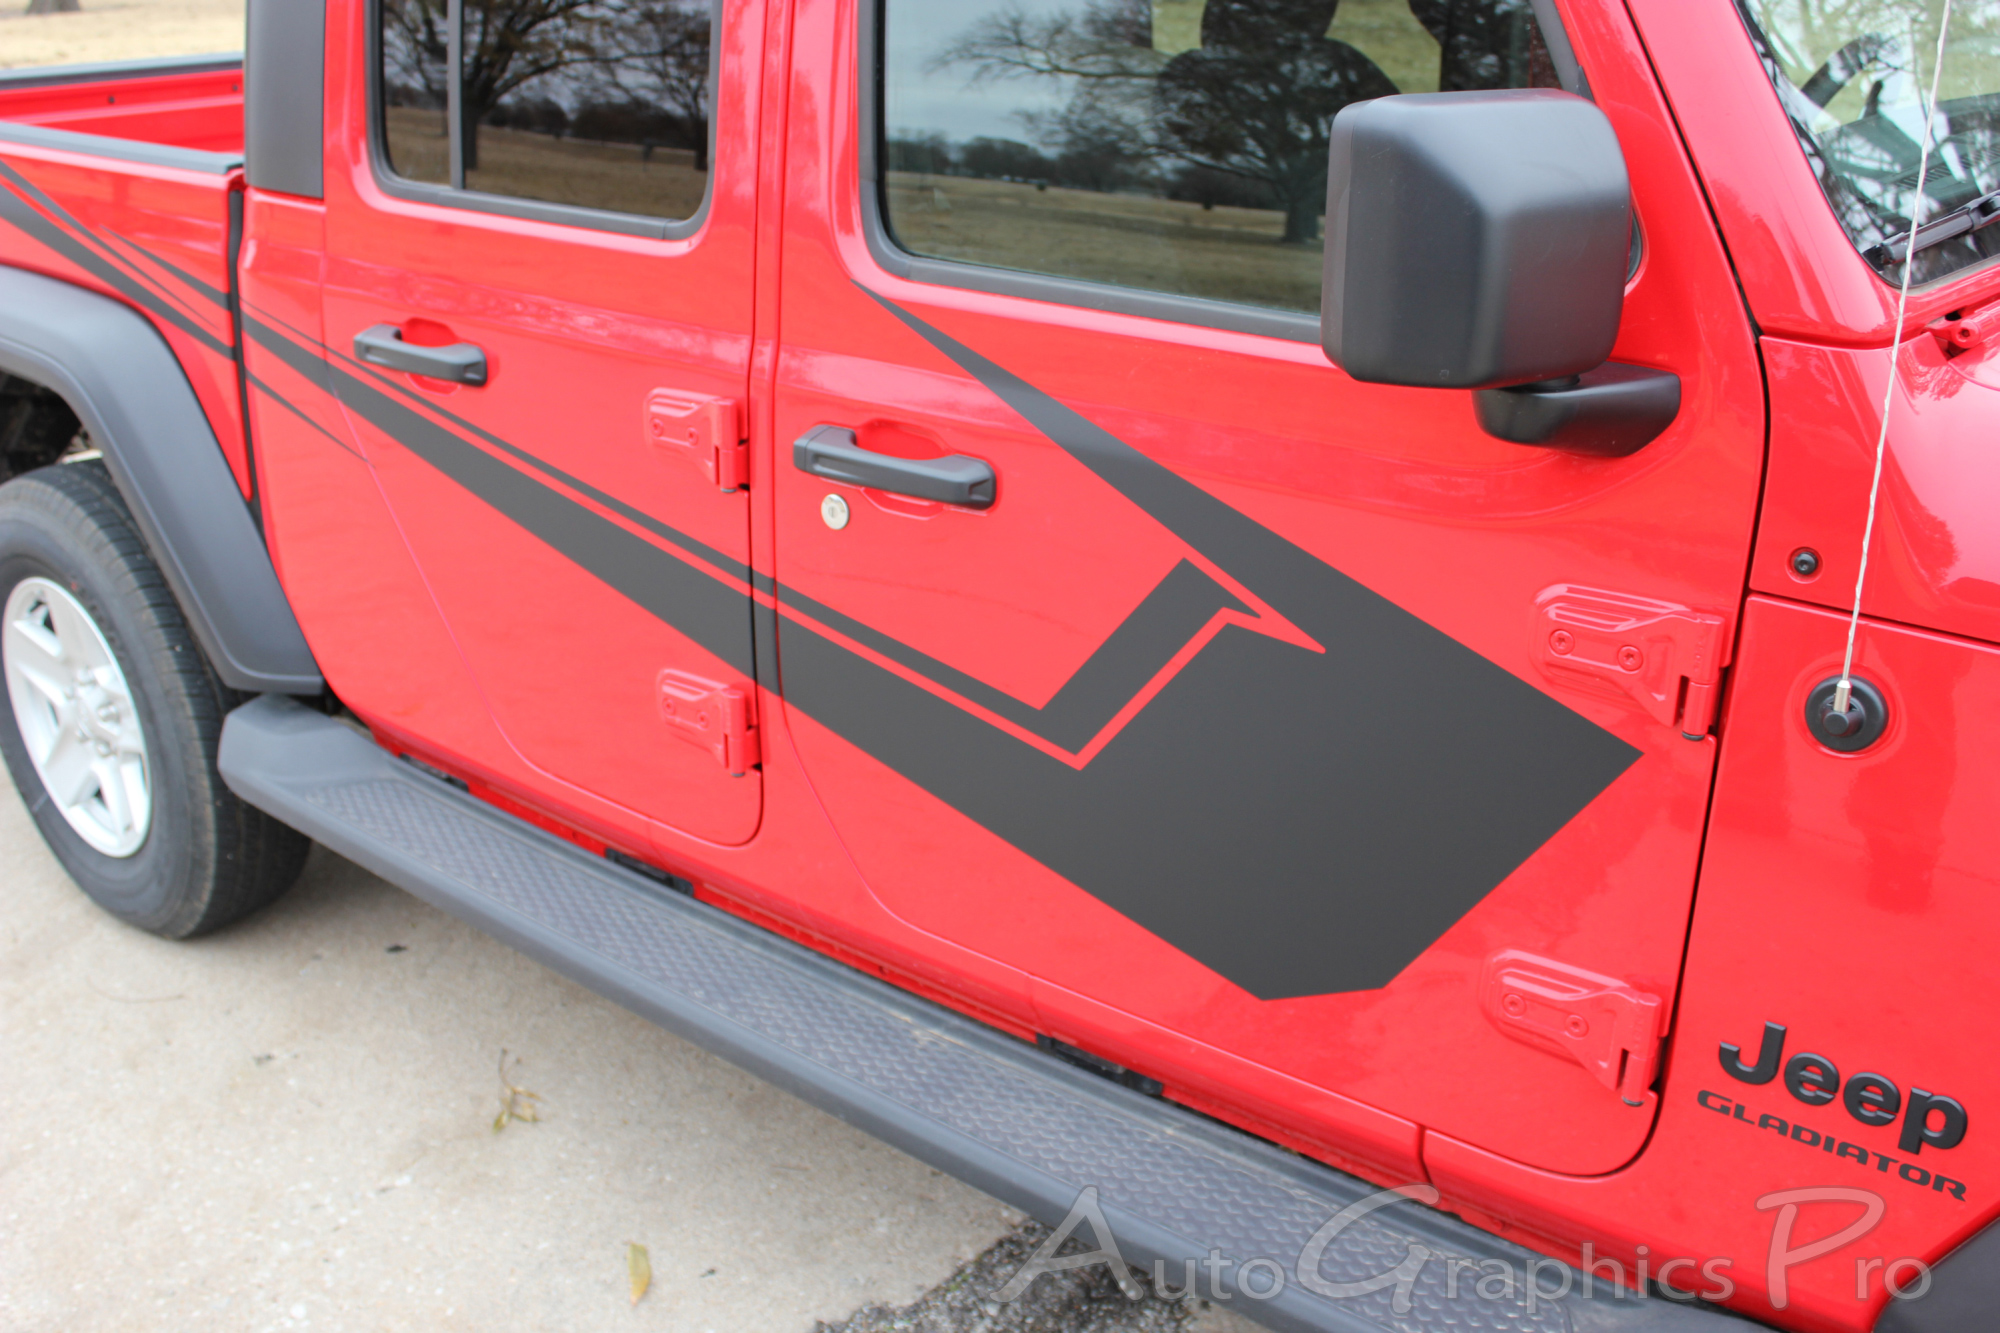 2 pcs WRANGLER UNLIMITED X fender decal MULTI-COLOR sticker compatible with Jeep wrangler Rubicon Unlimited sport YJ TJ JK JK JL JL